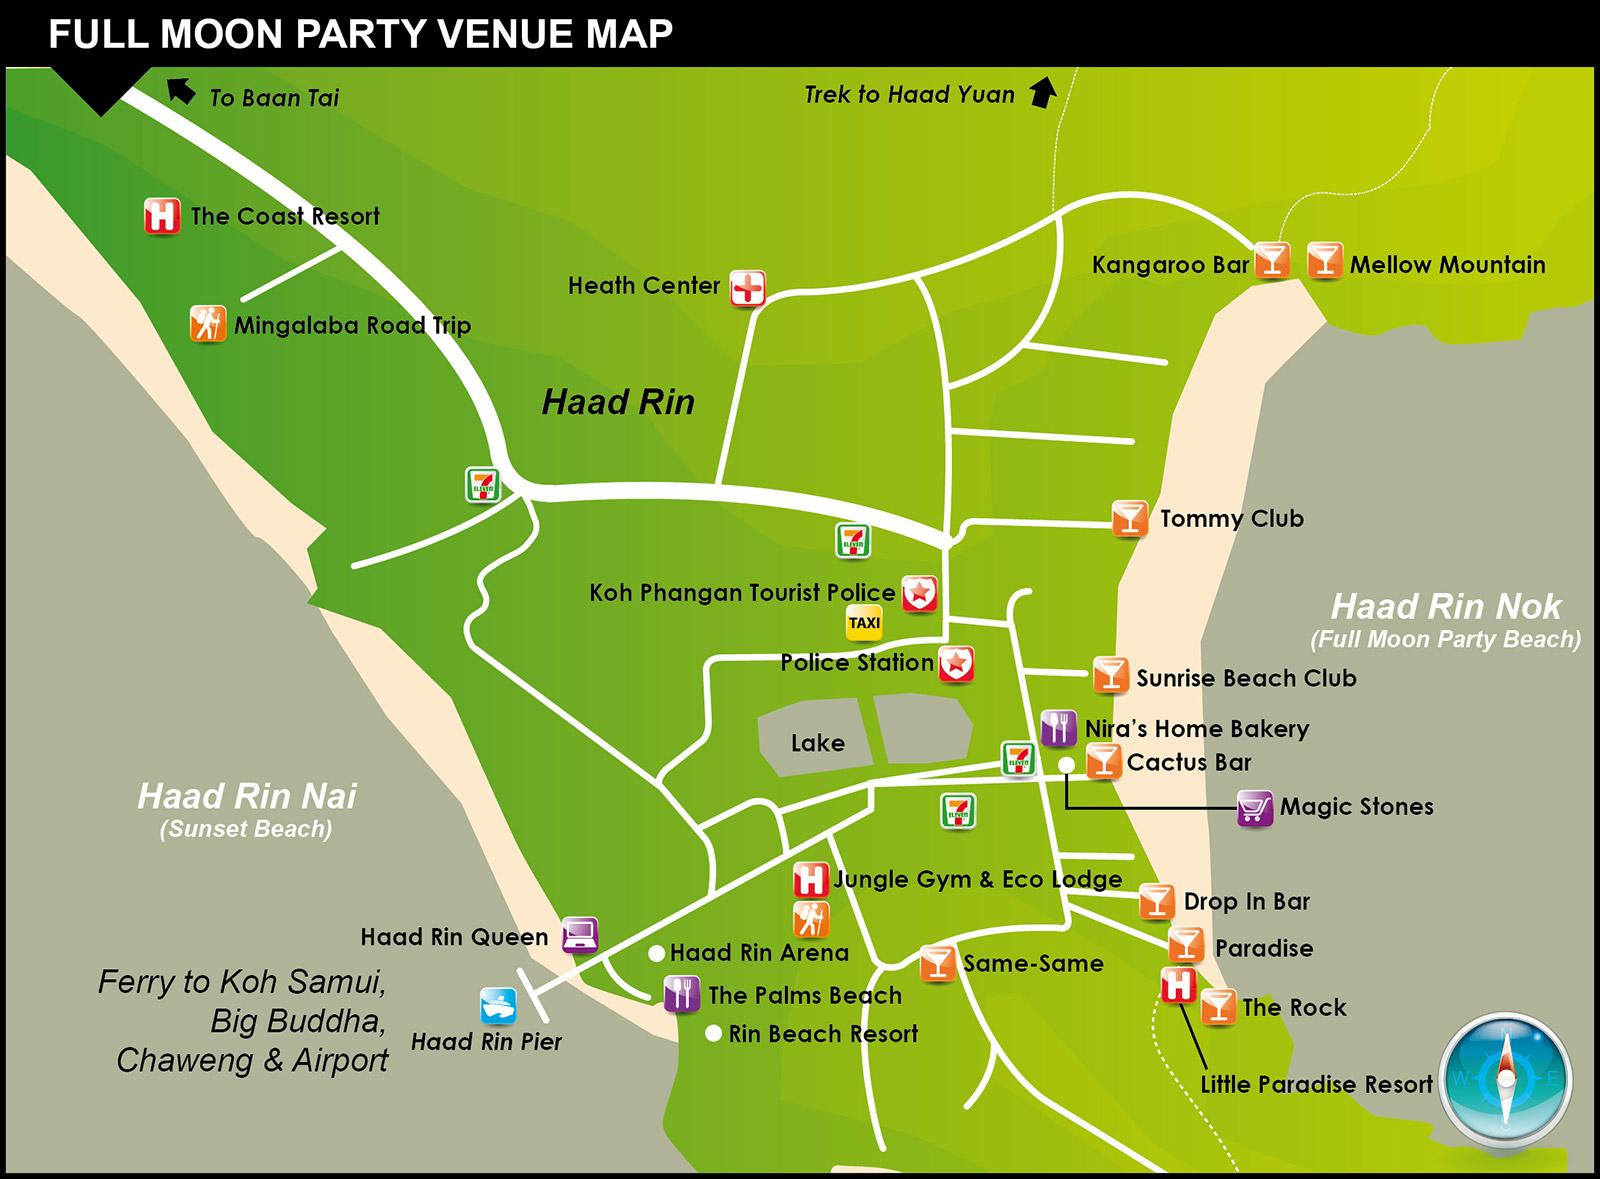 Full Moon Party Map – Koh Phangan Thailand